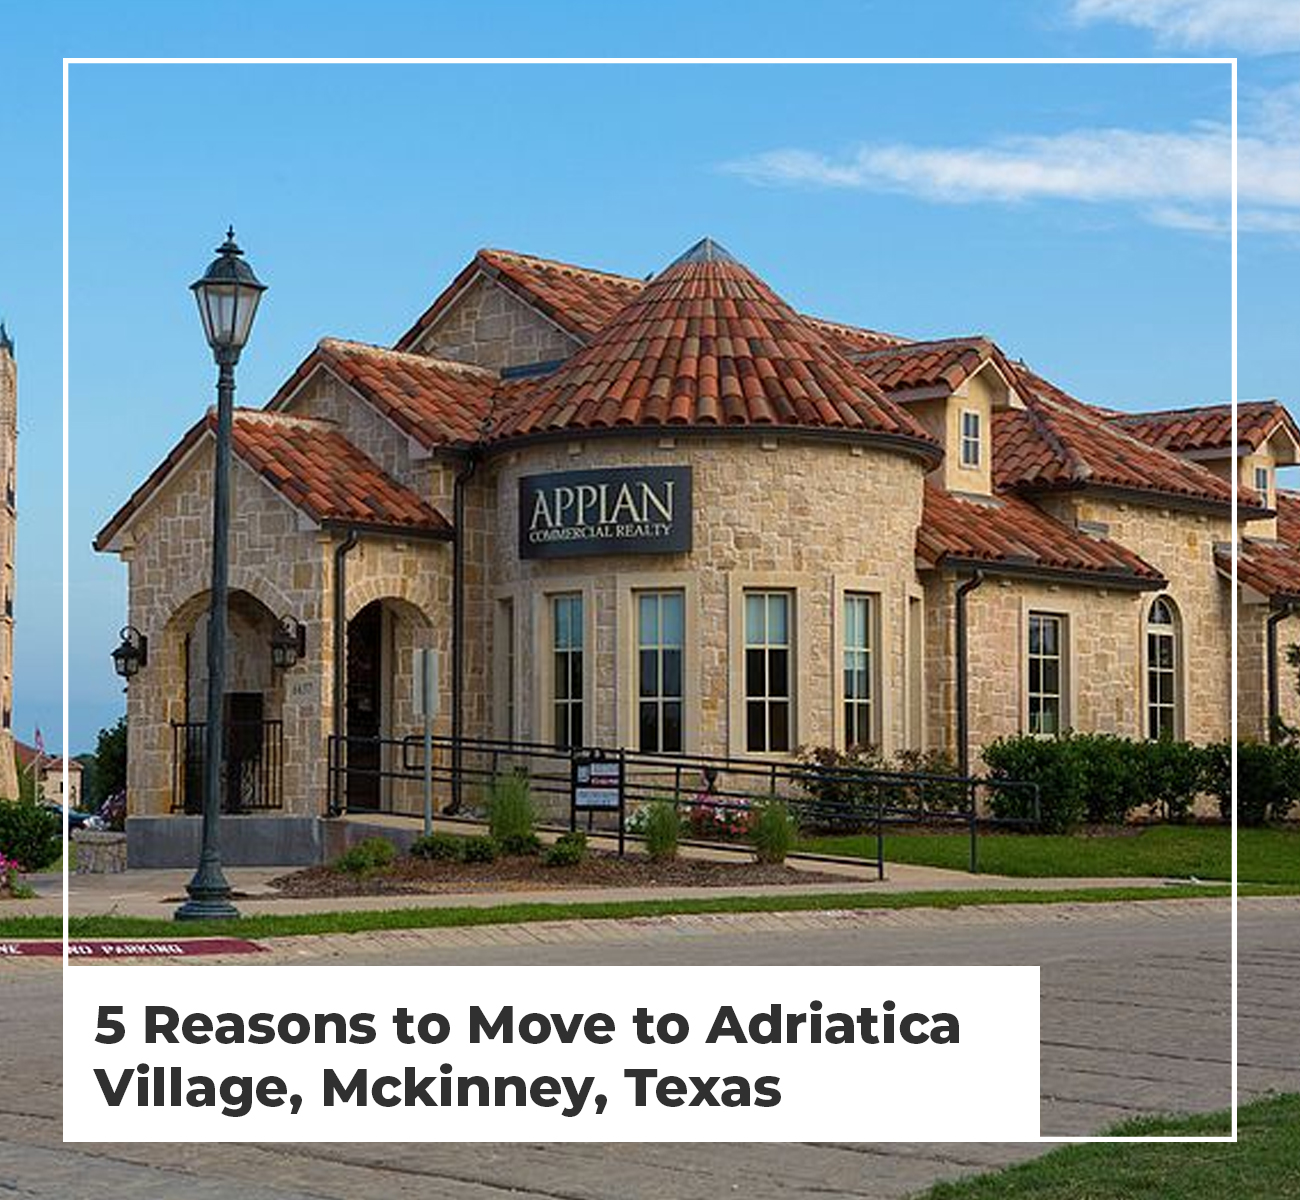 5 Reasons to Move to Adriatica Village